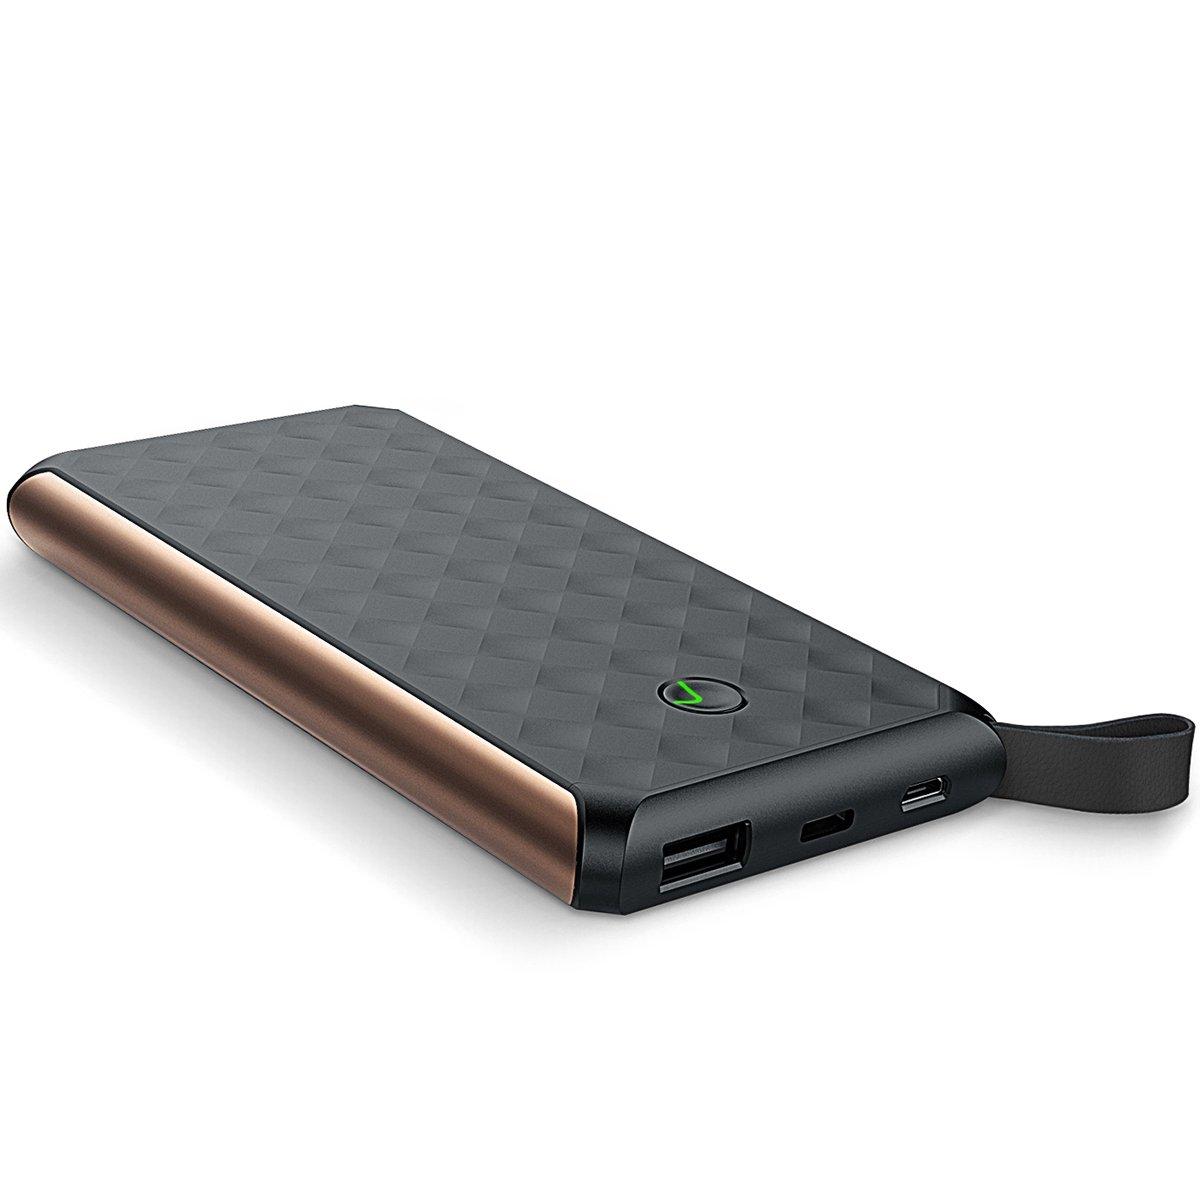 Luxtude 10000mAh Portable Charger, Dual Input Port (USB C Quick Recharging) Power Bank, 2 USB Ports 2.4A High Output External Batteries Compatible iPhone, iPad, Samsung Galaxy, LG- Black